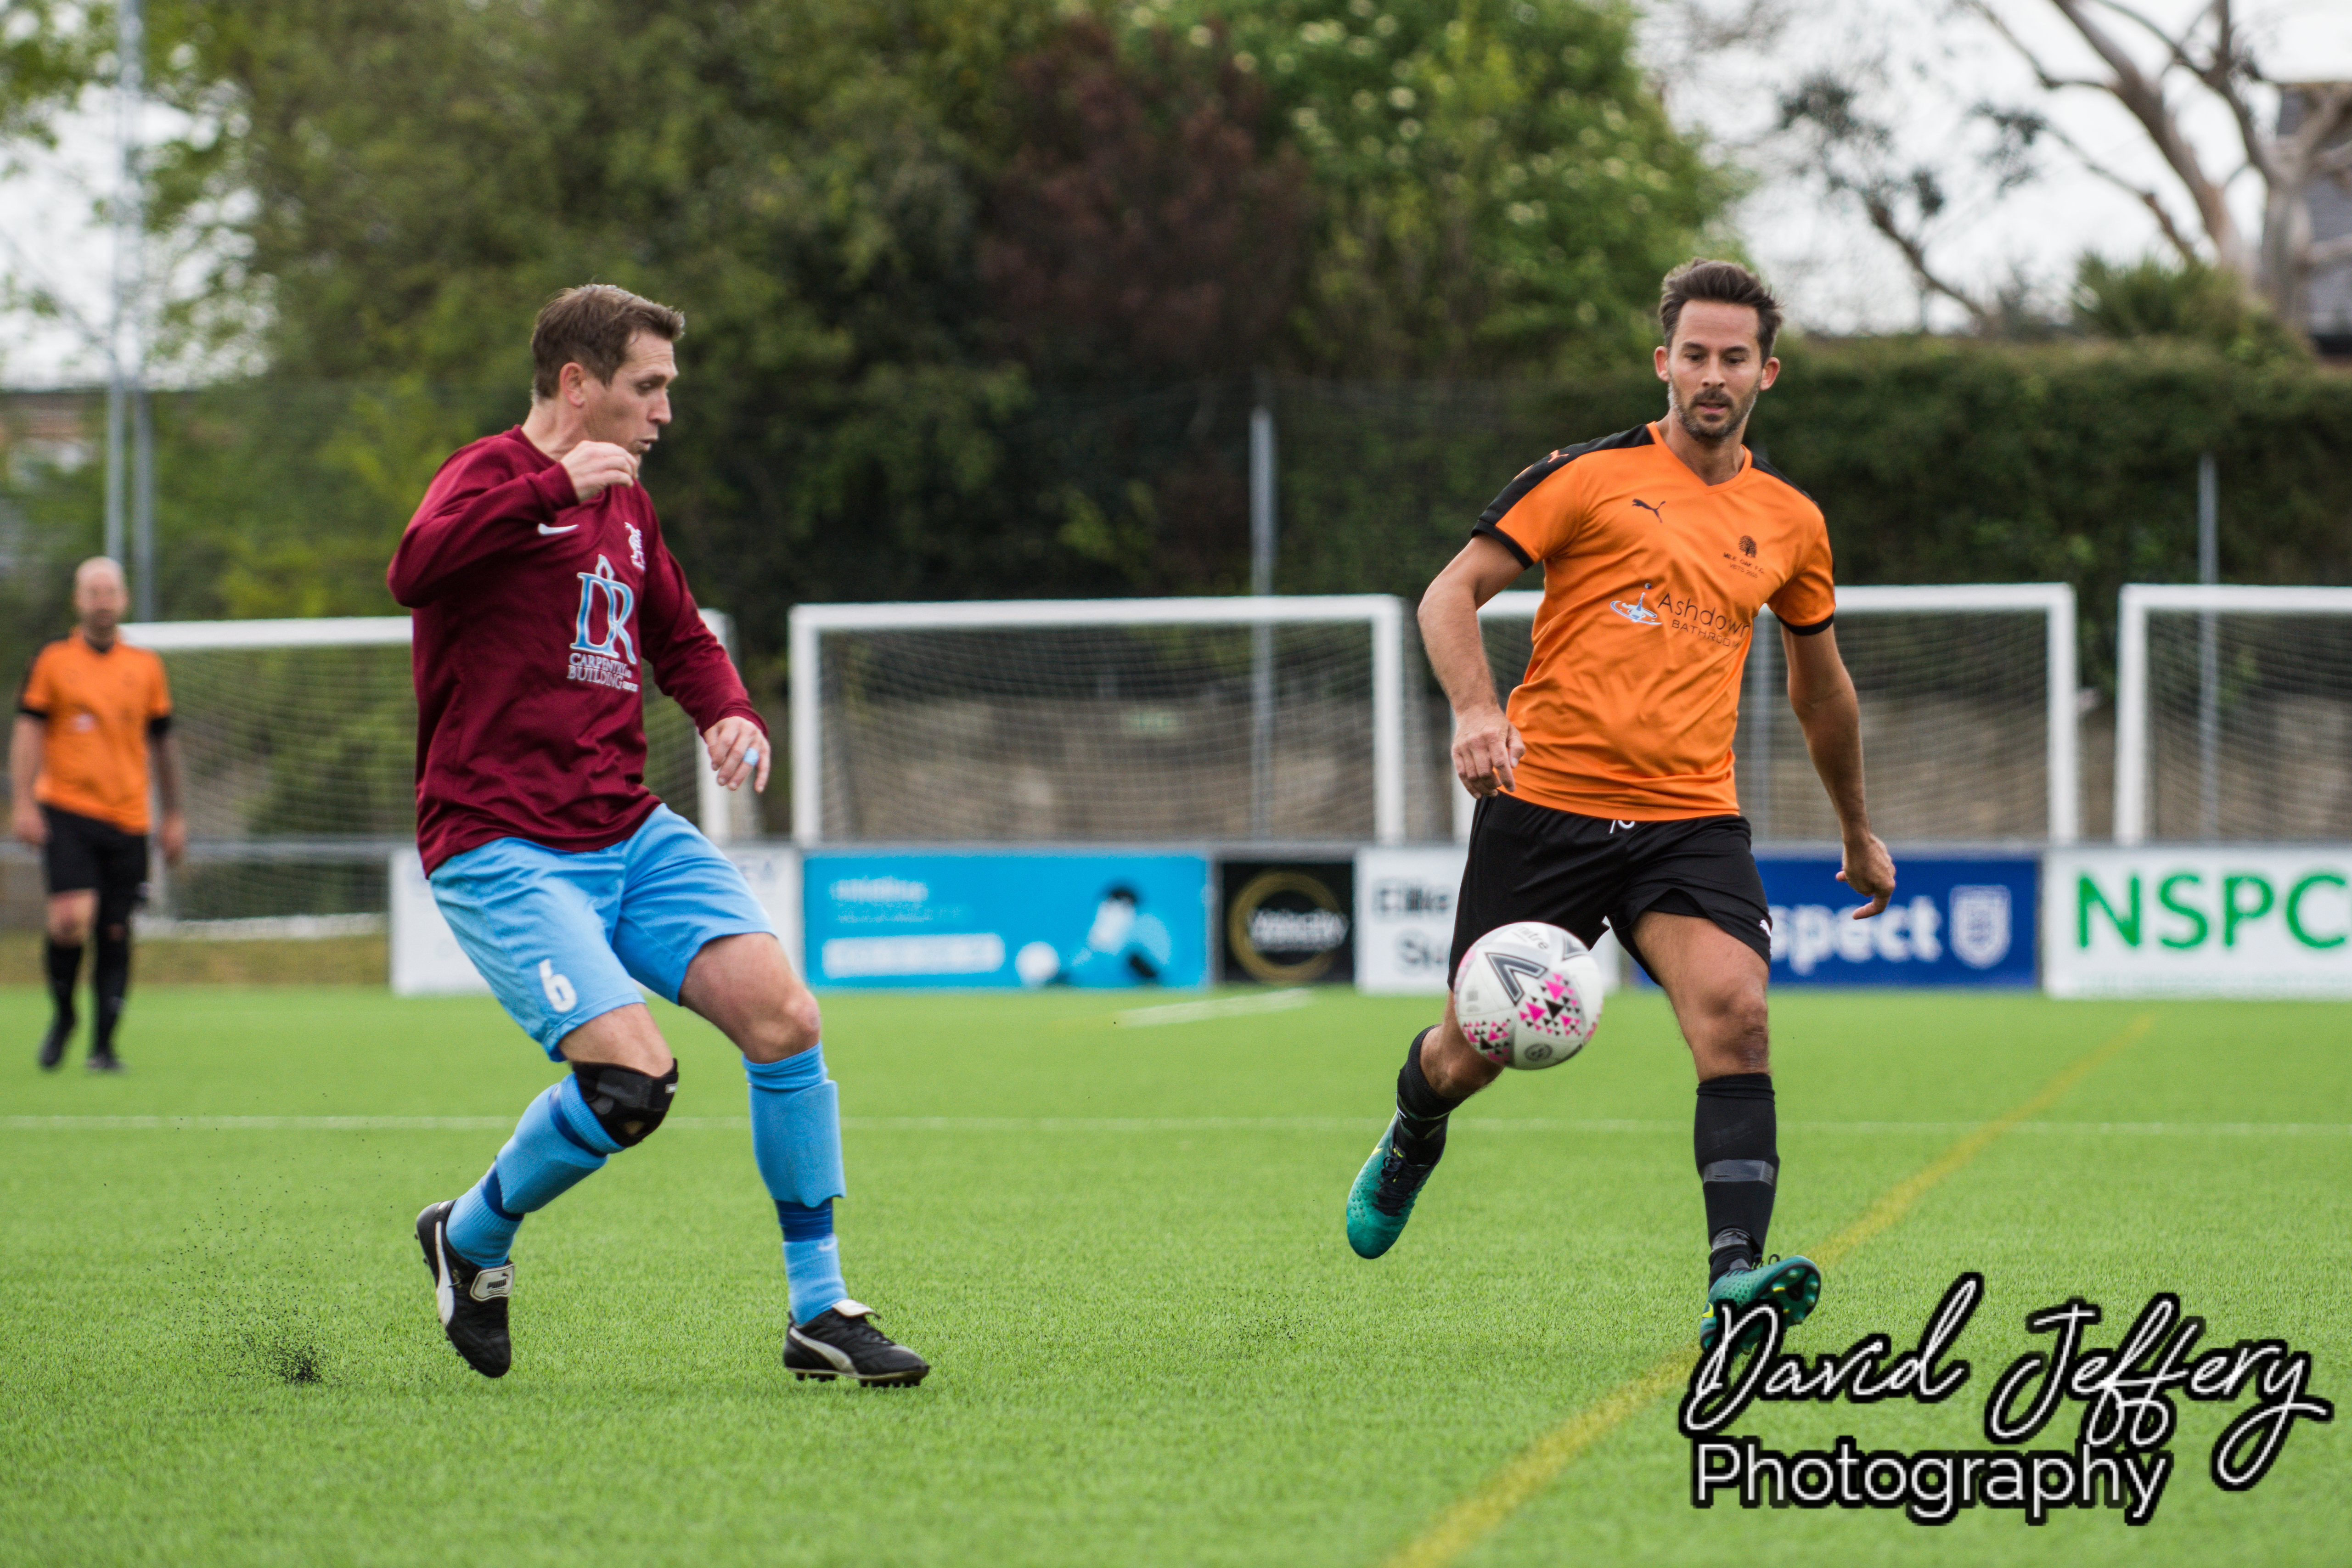 041 MOFC Vets vs Horl Vets 05.05